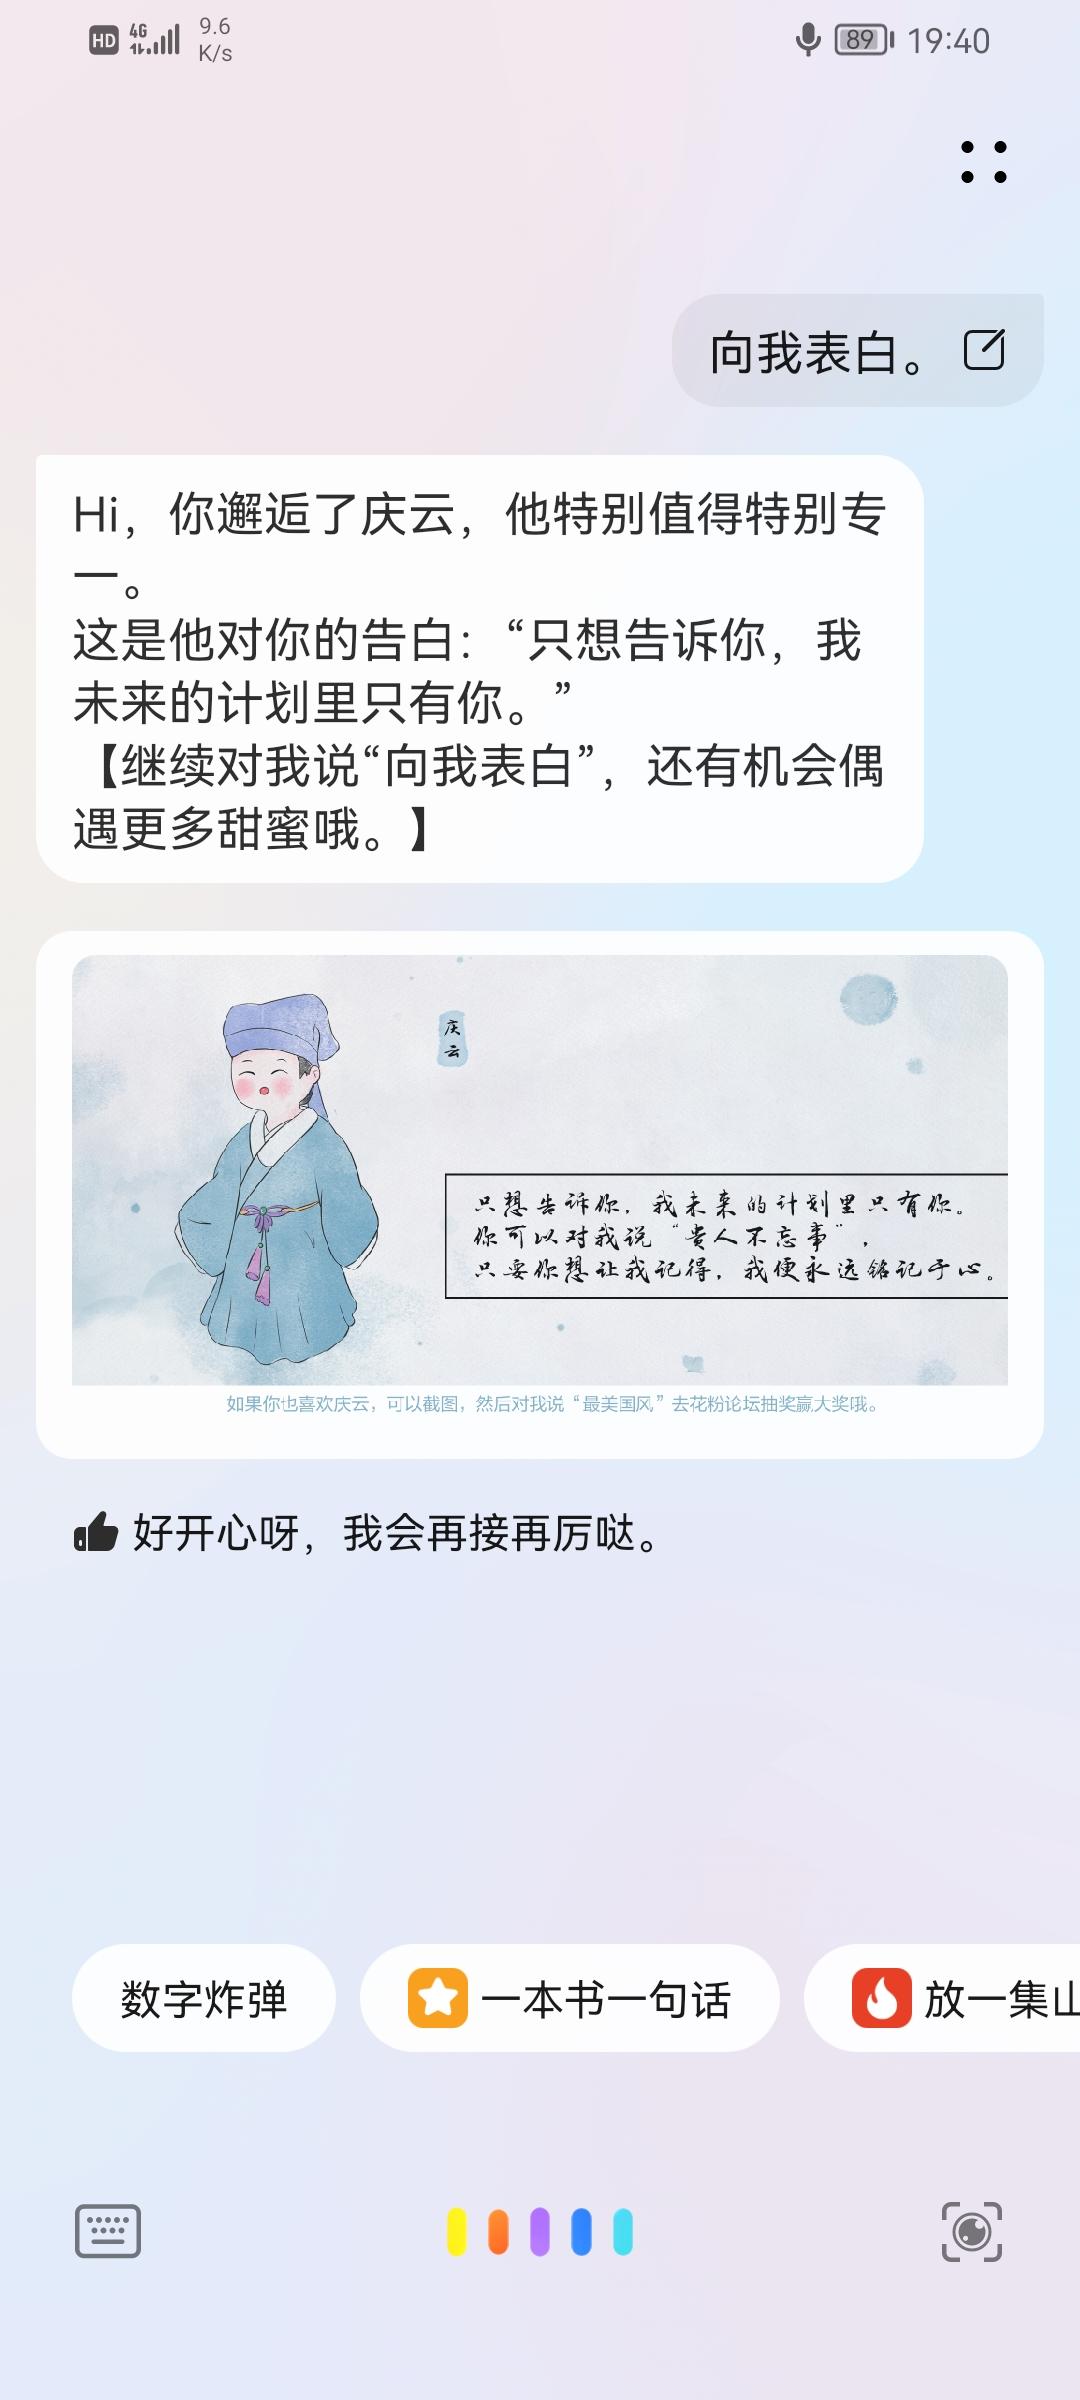 Screenshot_20210611_194018_com.huawei.vassistant.jpg